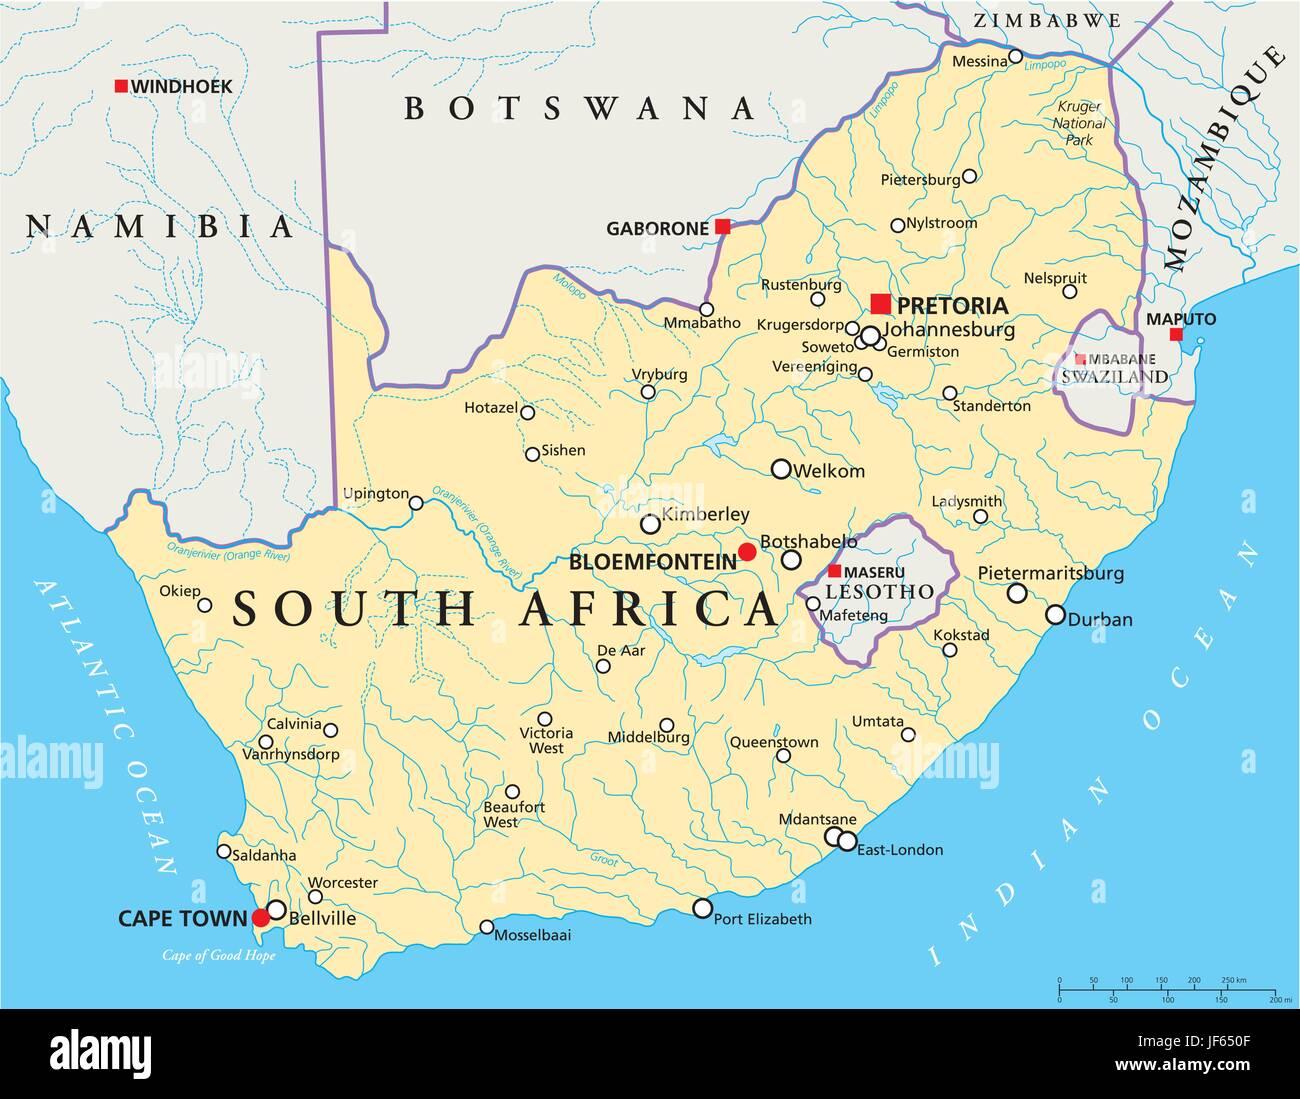 Cape Of Good Hope Map Stockfotos & Cape Of Good Hope Map Bilder - Alamy